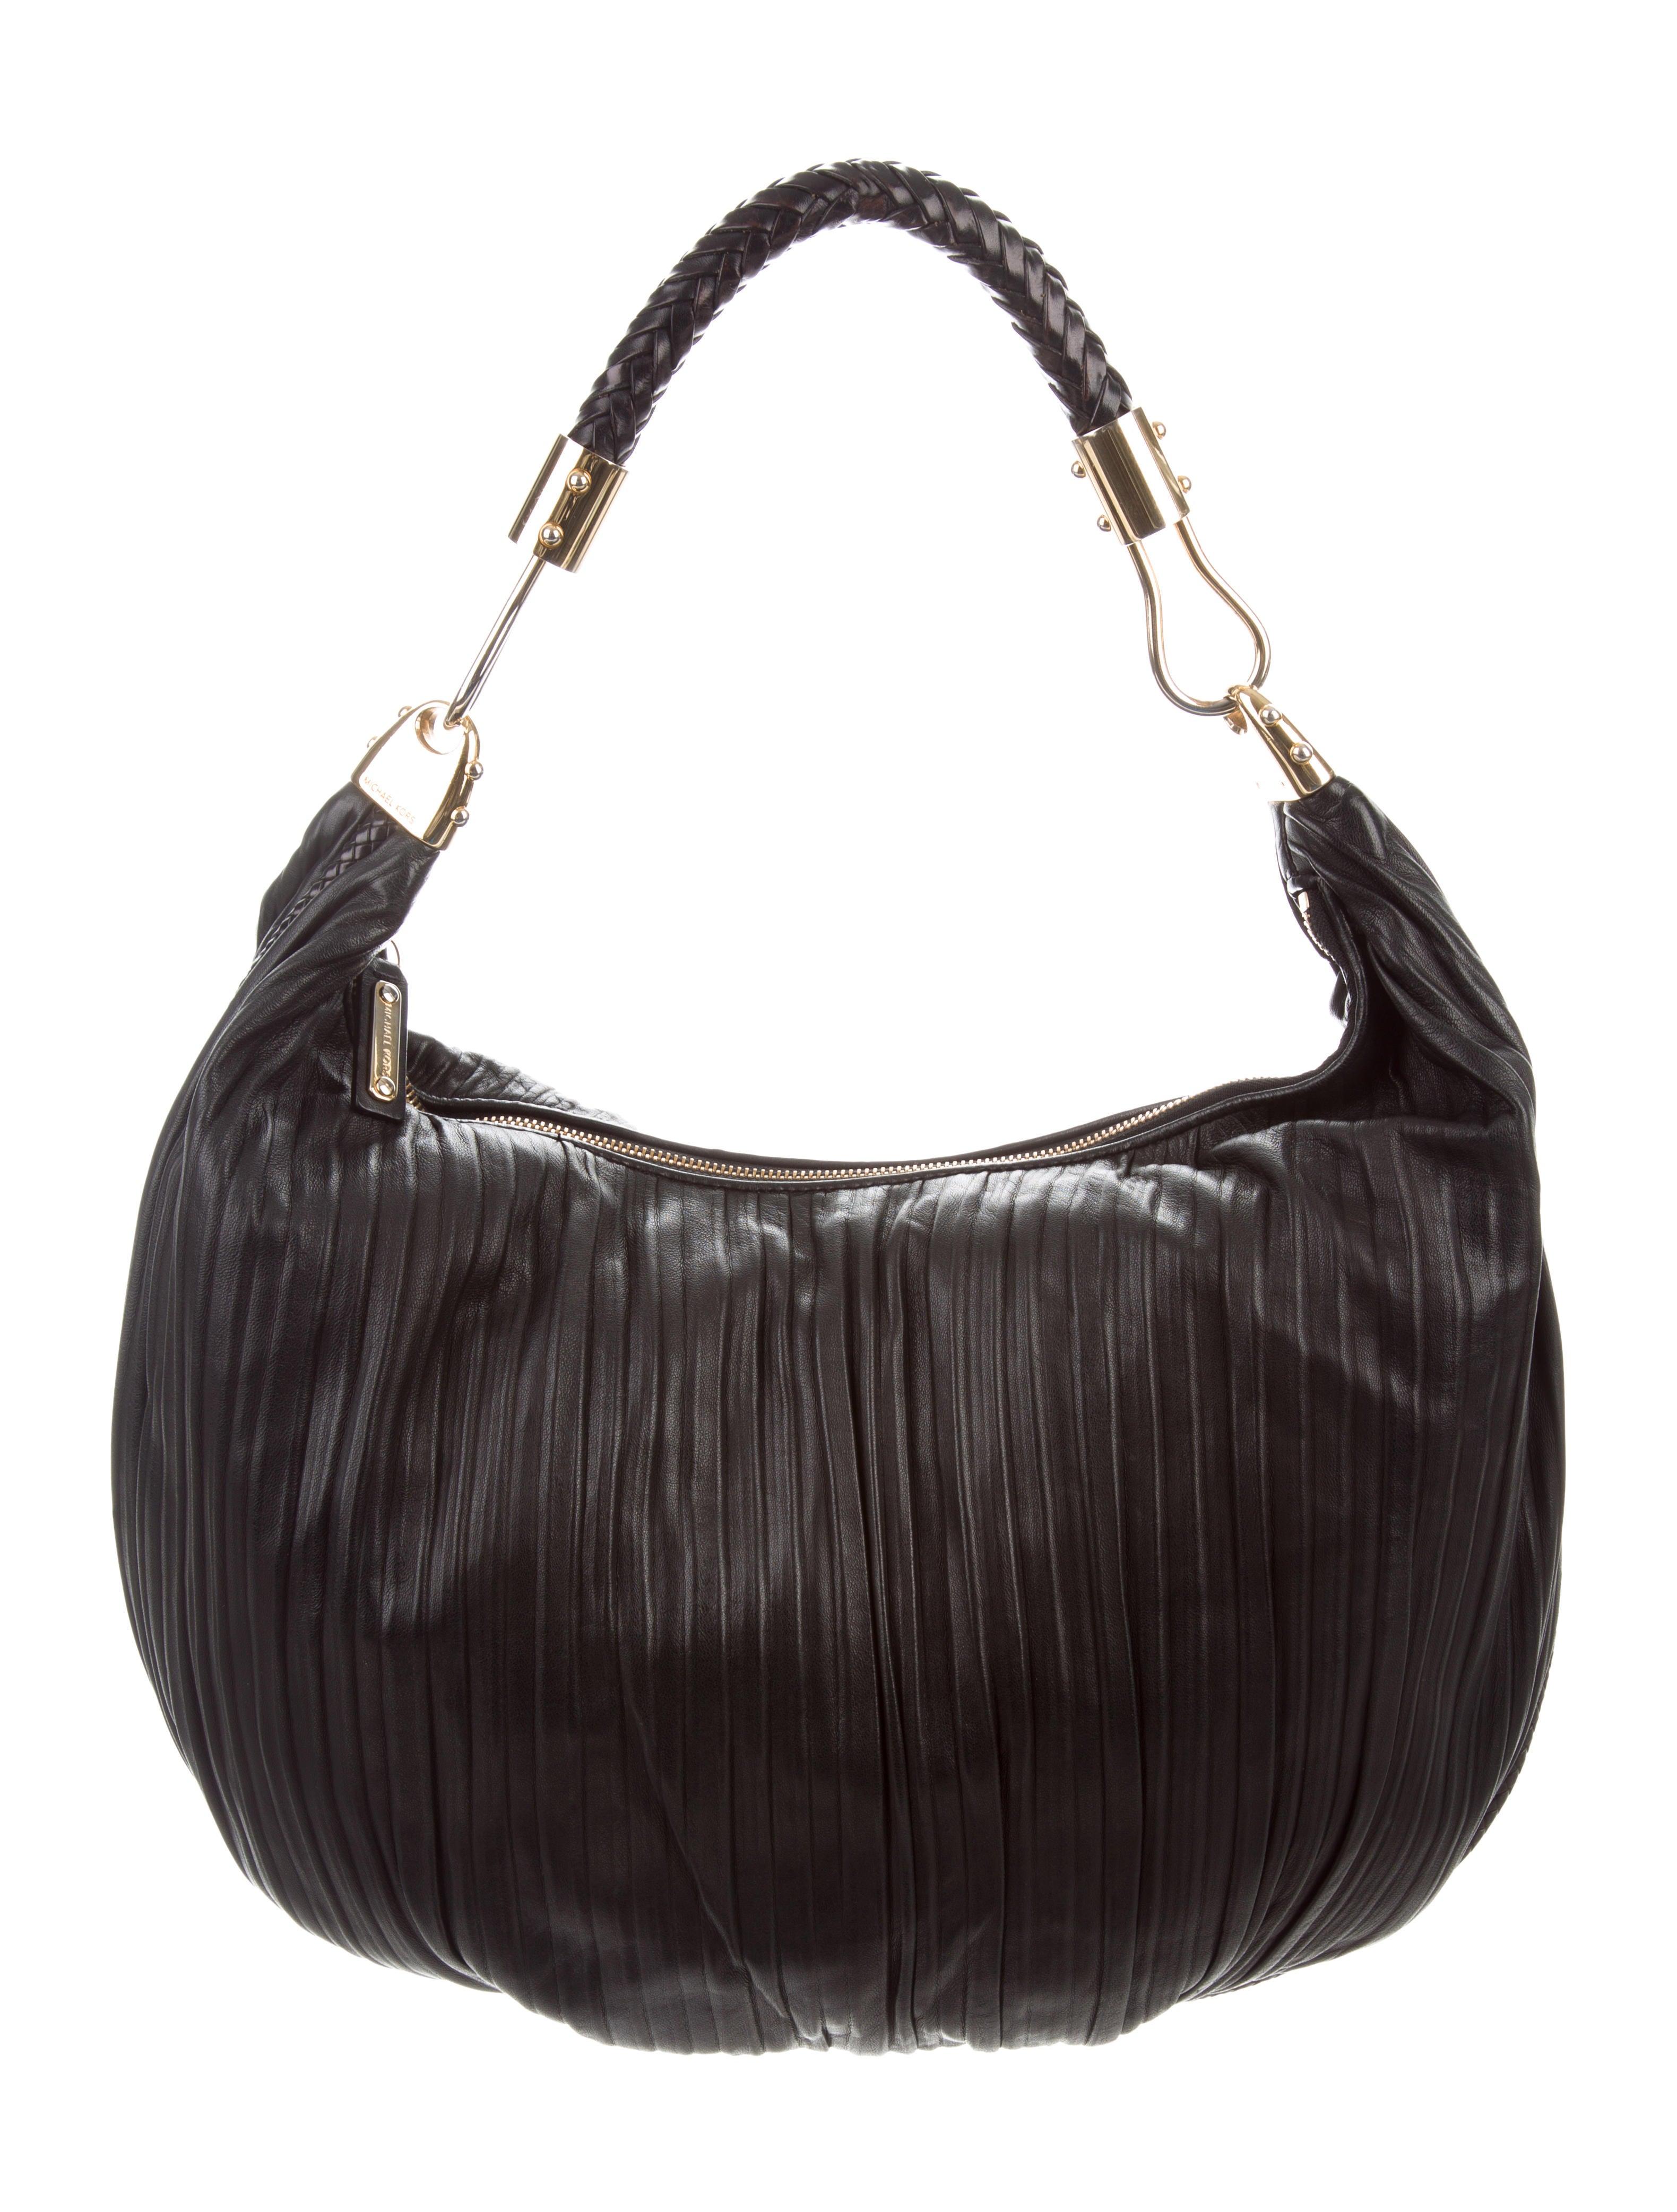 386be1d1280a Michael Kors Skorpios Leather Hobo - Handbags - MIC78332 | The RealReal